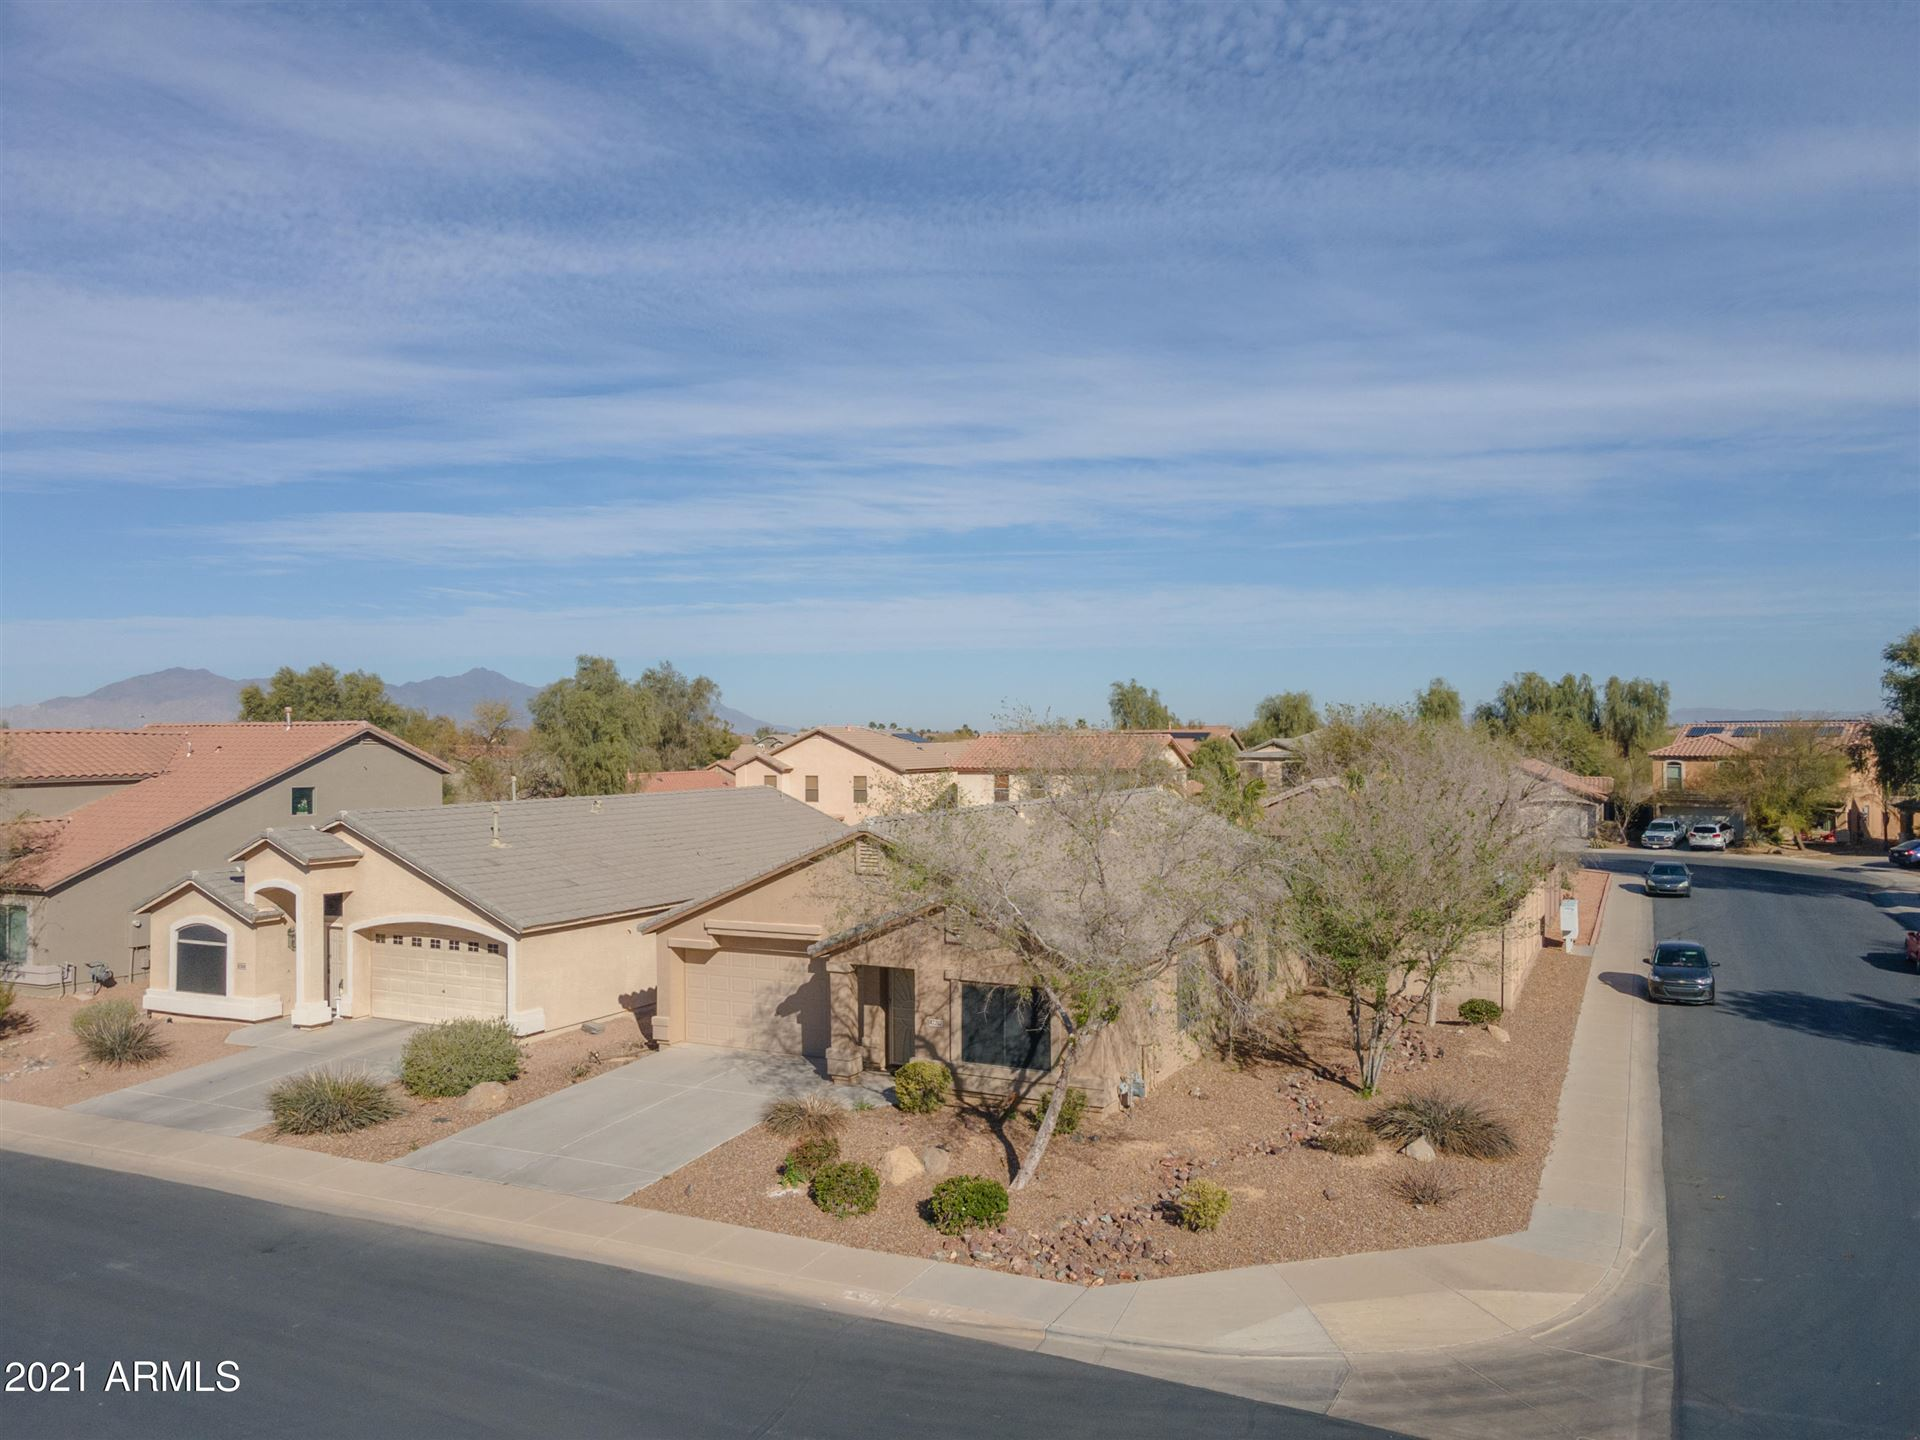 Photo of 42252 W COLBY Drive, Maricopa, AZ 85138 (MLS # 6199441)